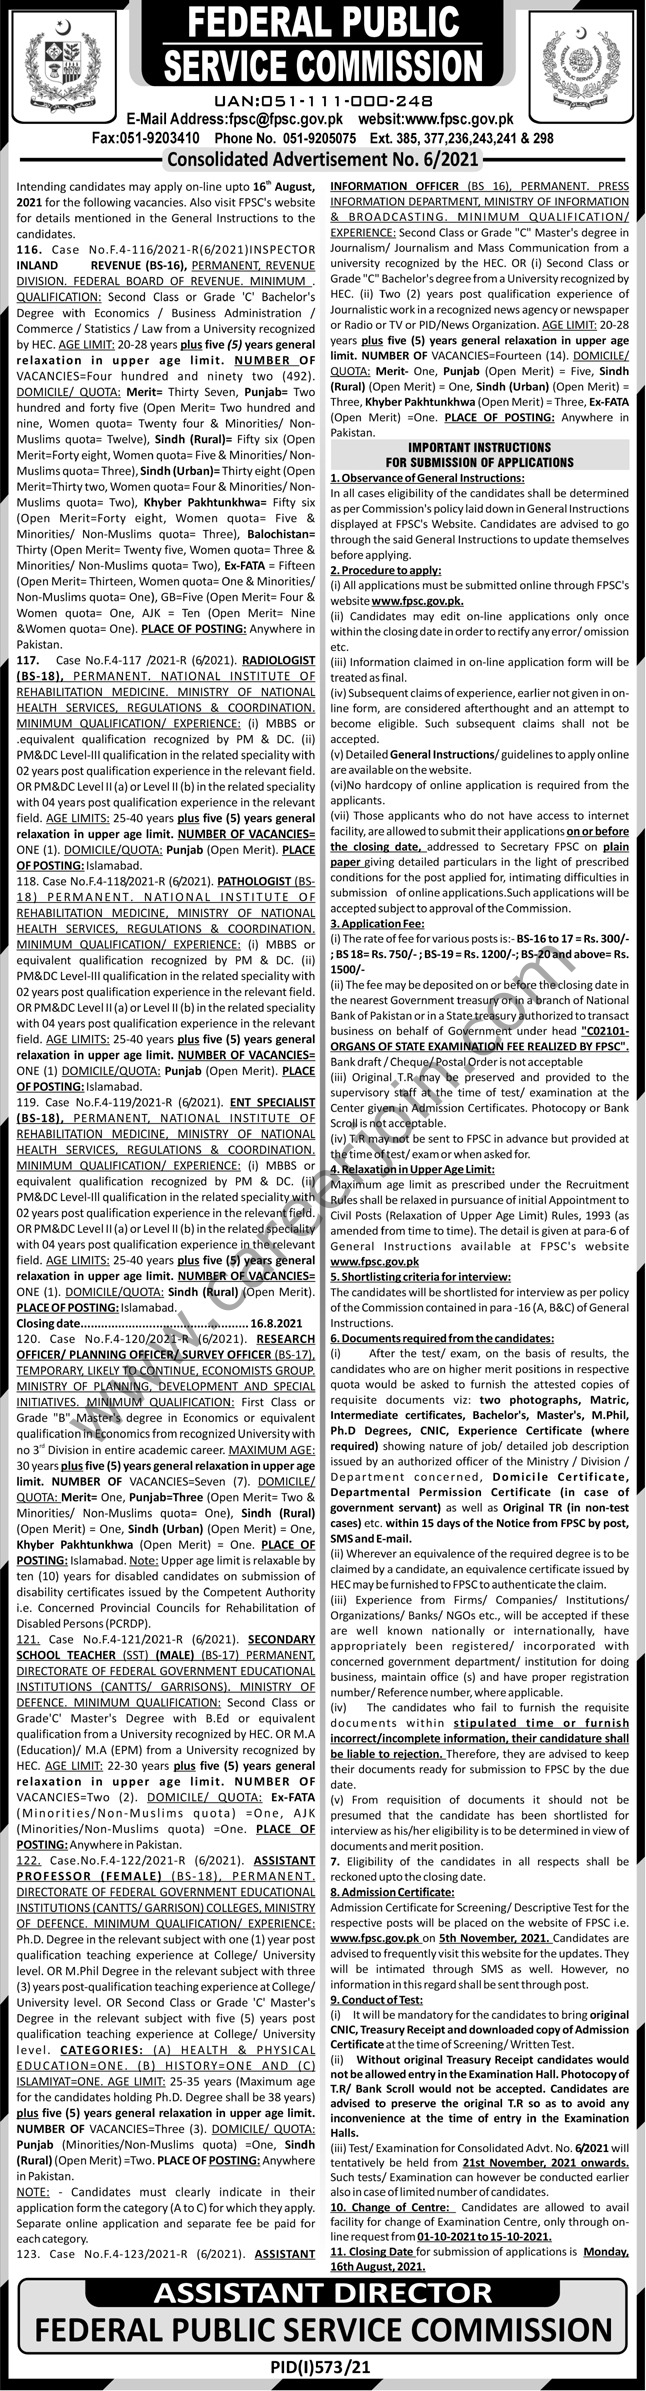 Federal Public Service Commission FPSC Jobs August 2021